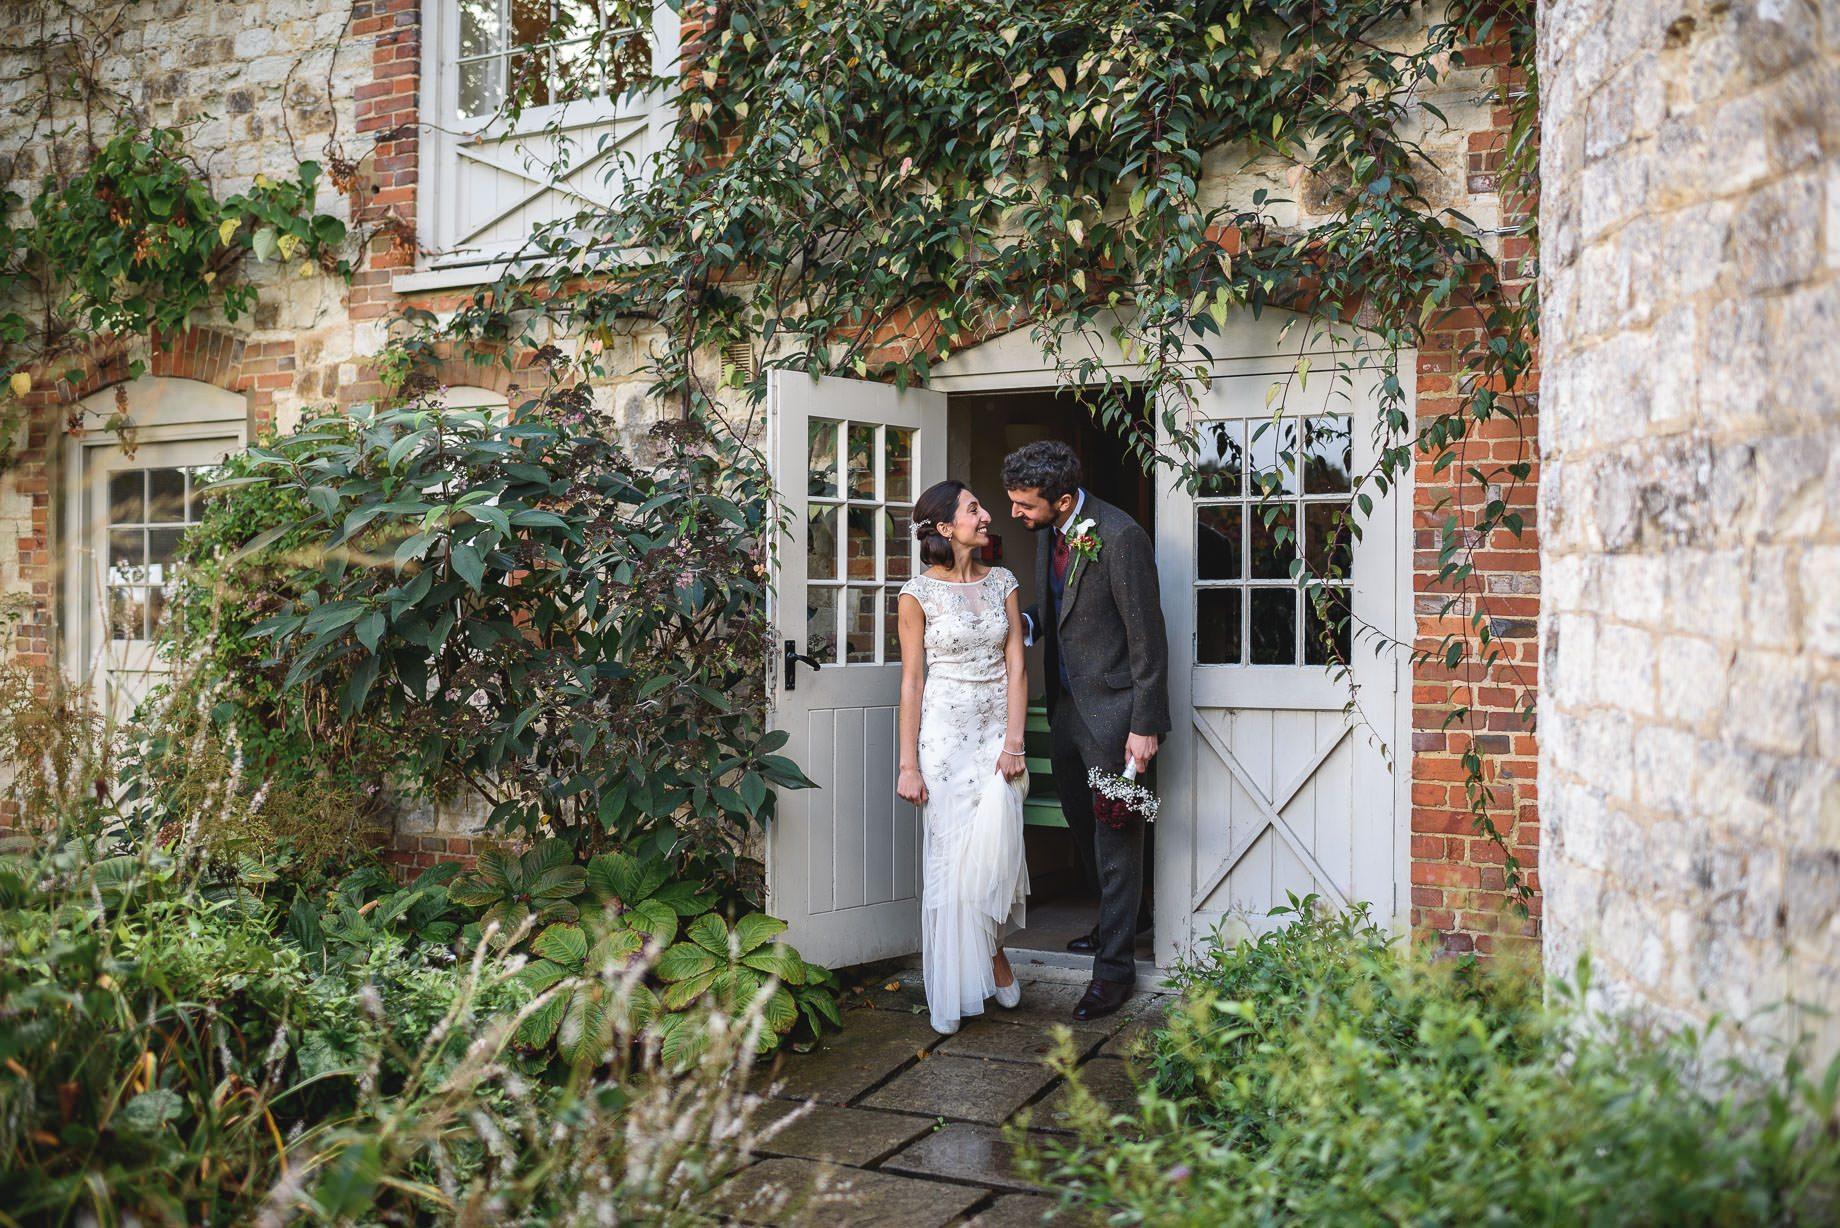 bury-court-barn-wedding-photography-guy-collier-photography-nadia-tom-79-of-184